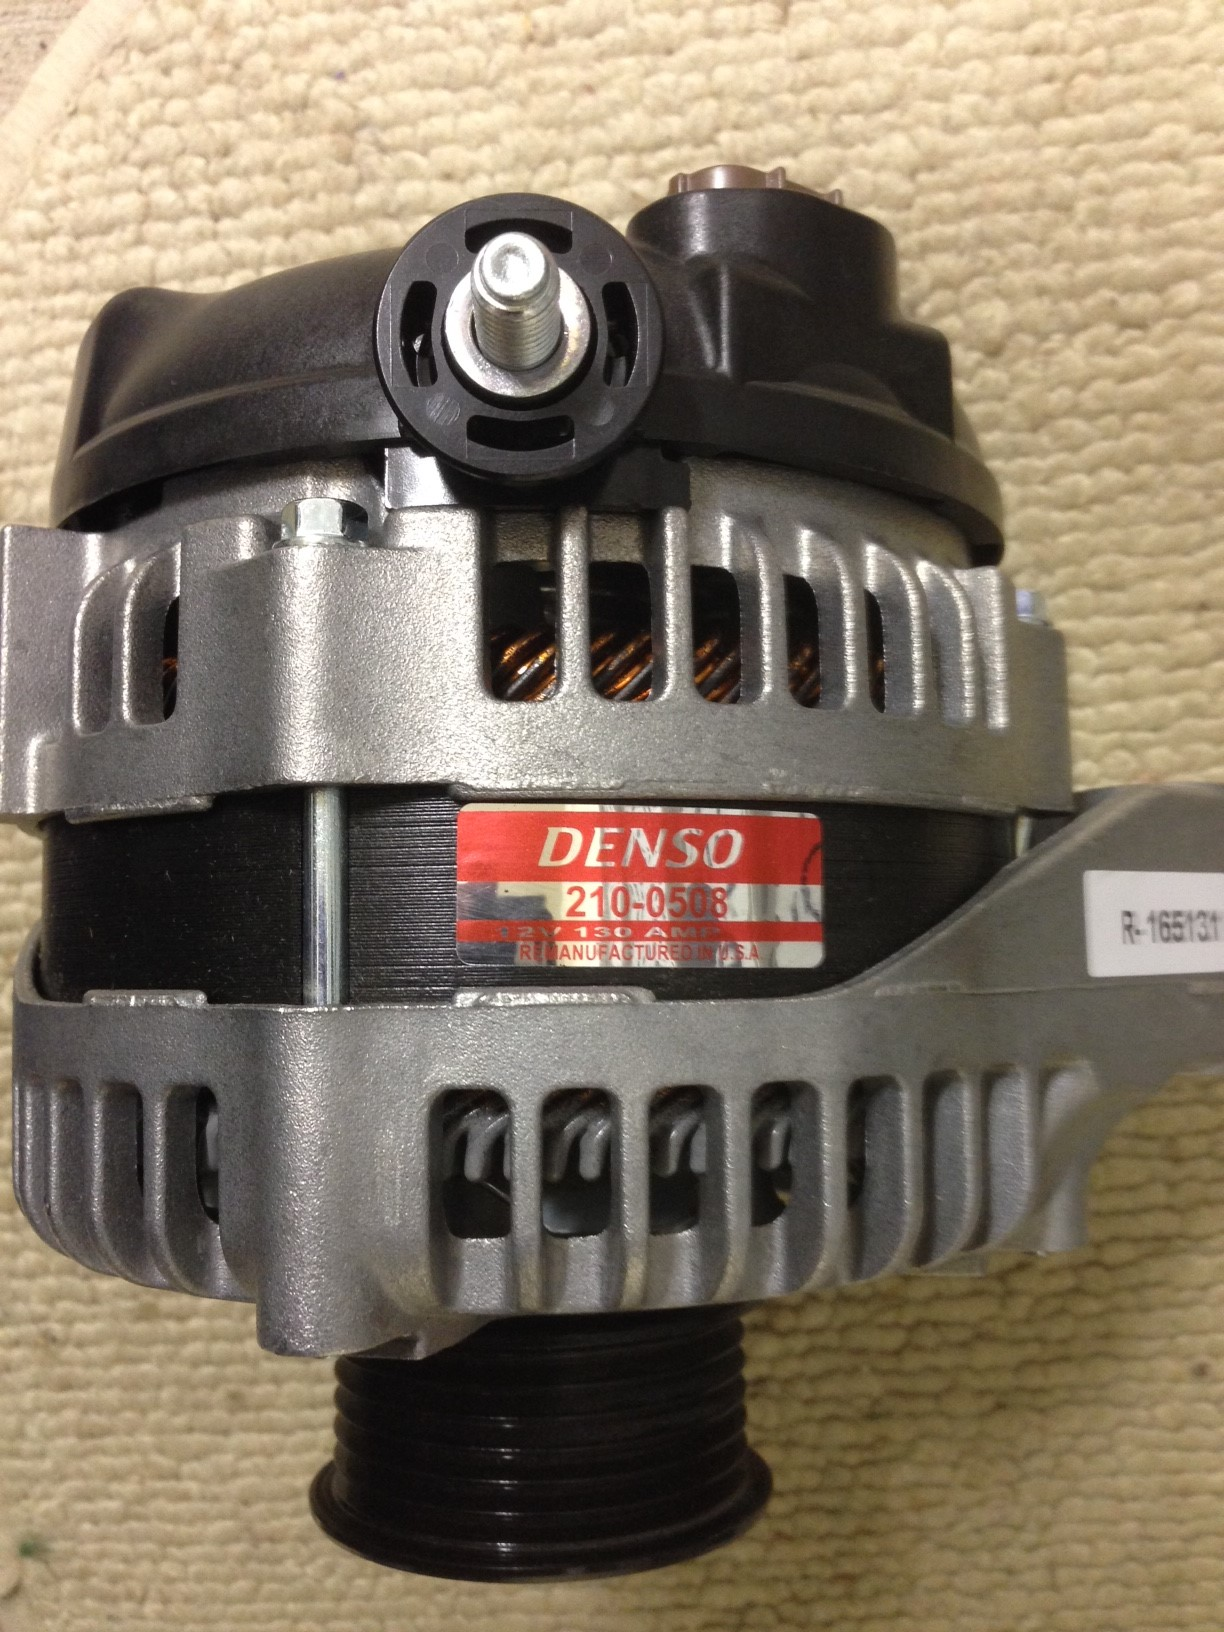 hight resolution of 2003 ls430 alternator wiring lexus wiring library2003 ls430 alternator wiring lexus